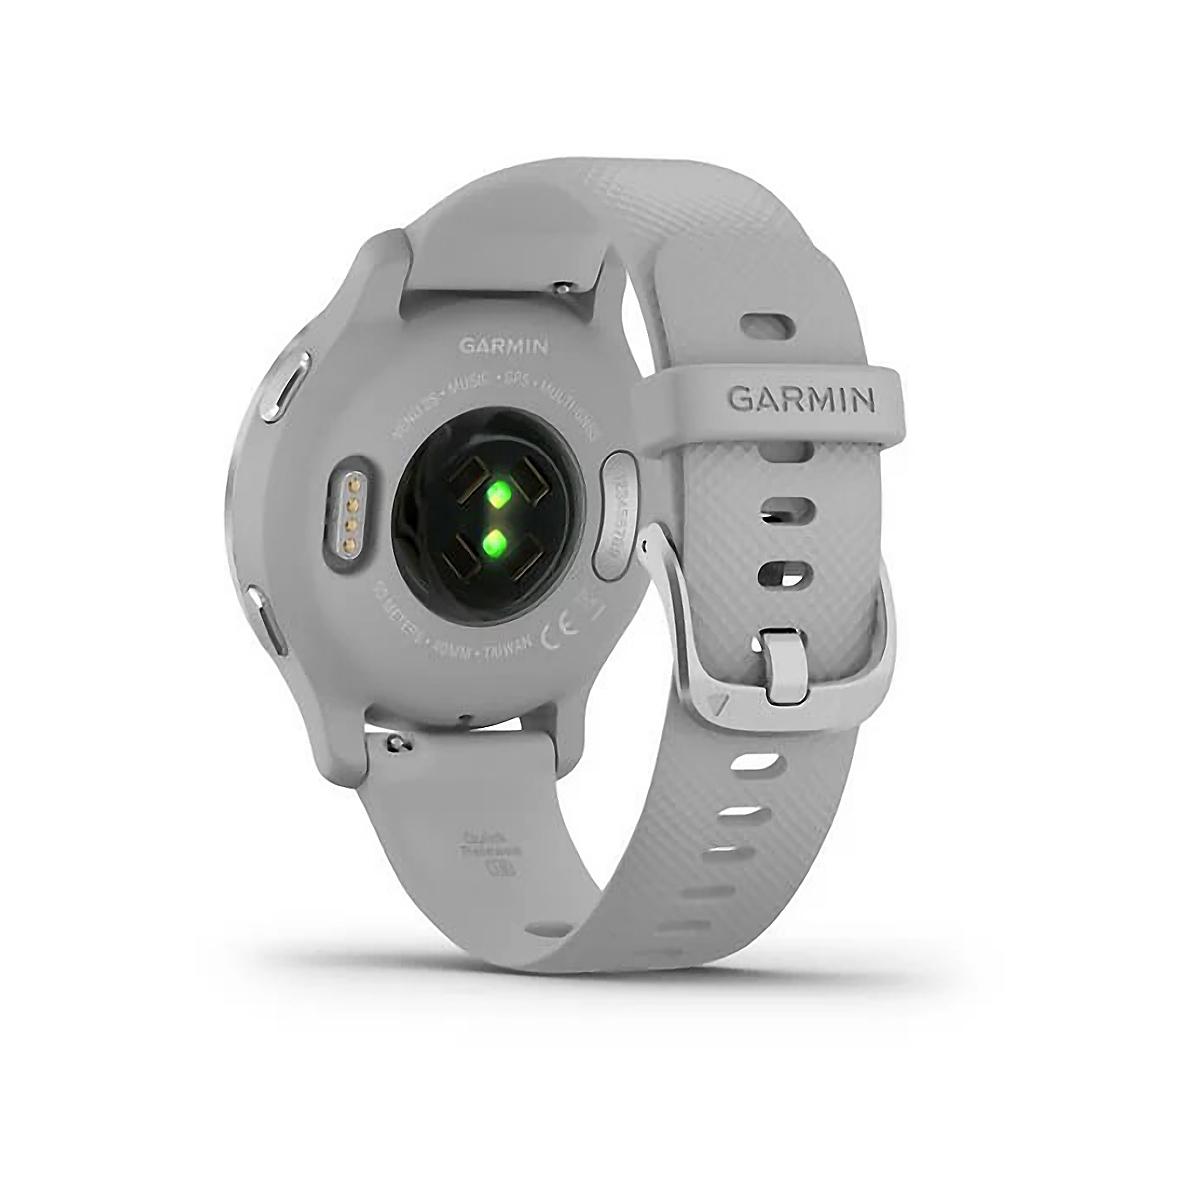 Garmin Venu 2S - Color: Mist Grey, Mist Grey, large, image 7